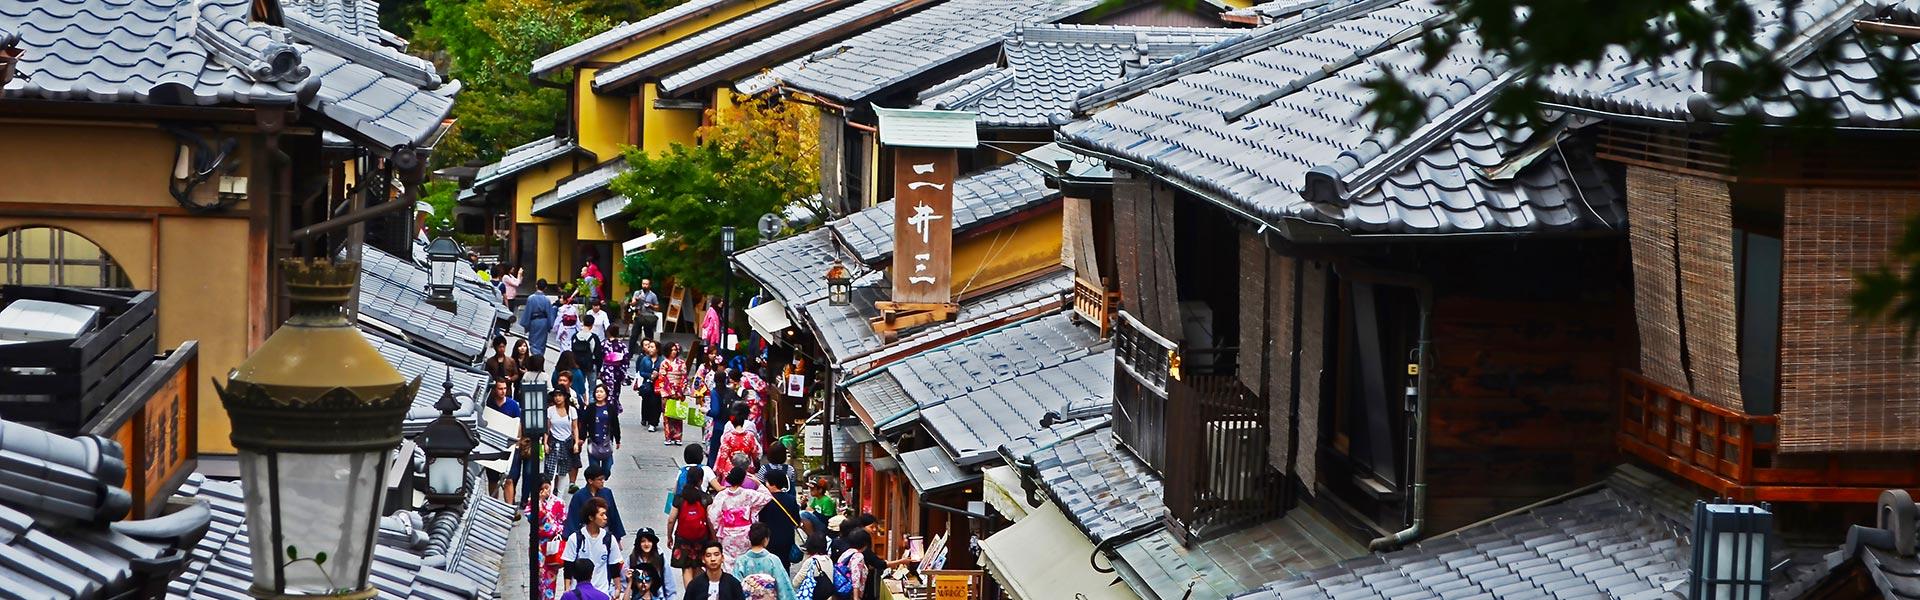 The Original Kyoto Free Walking Tour